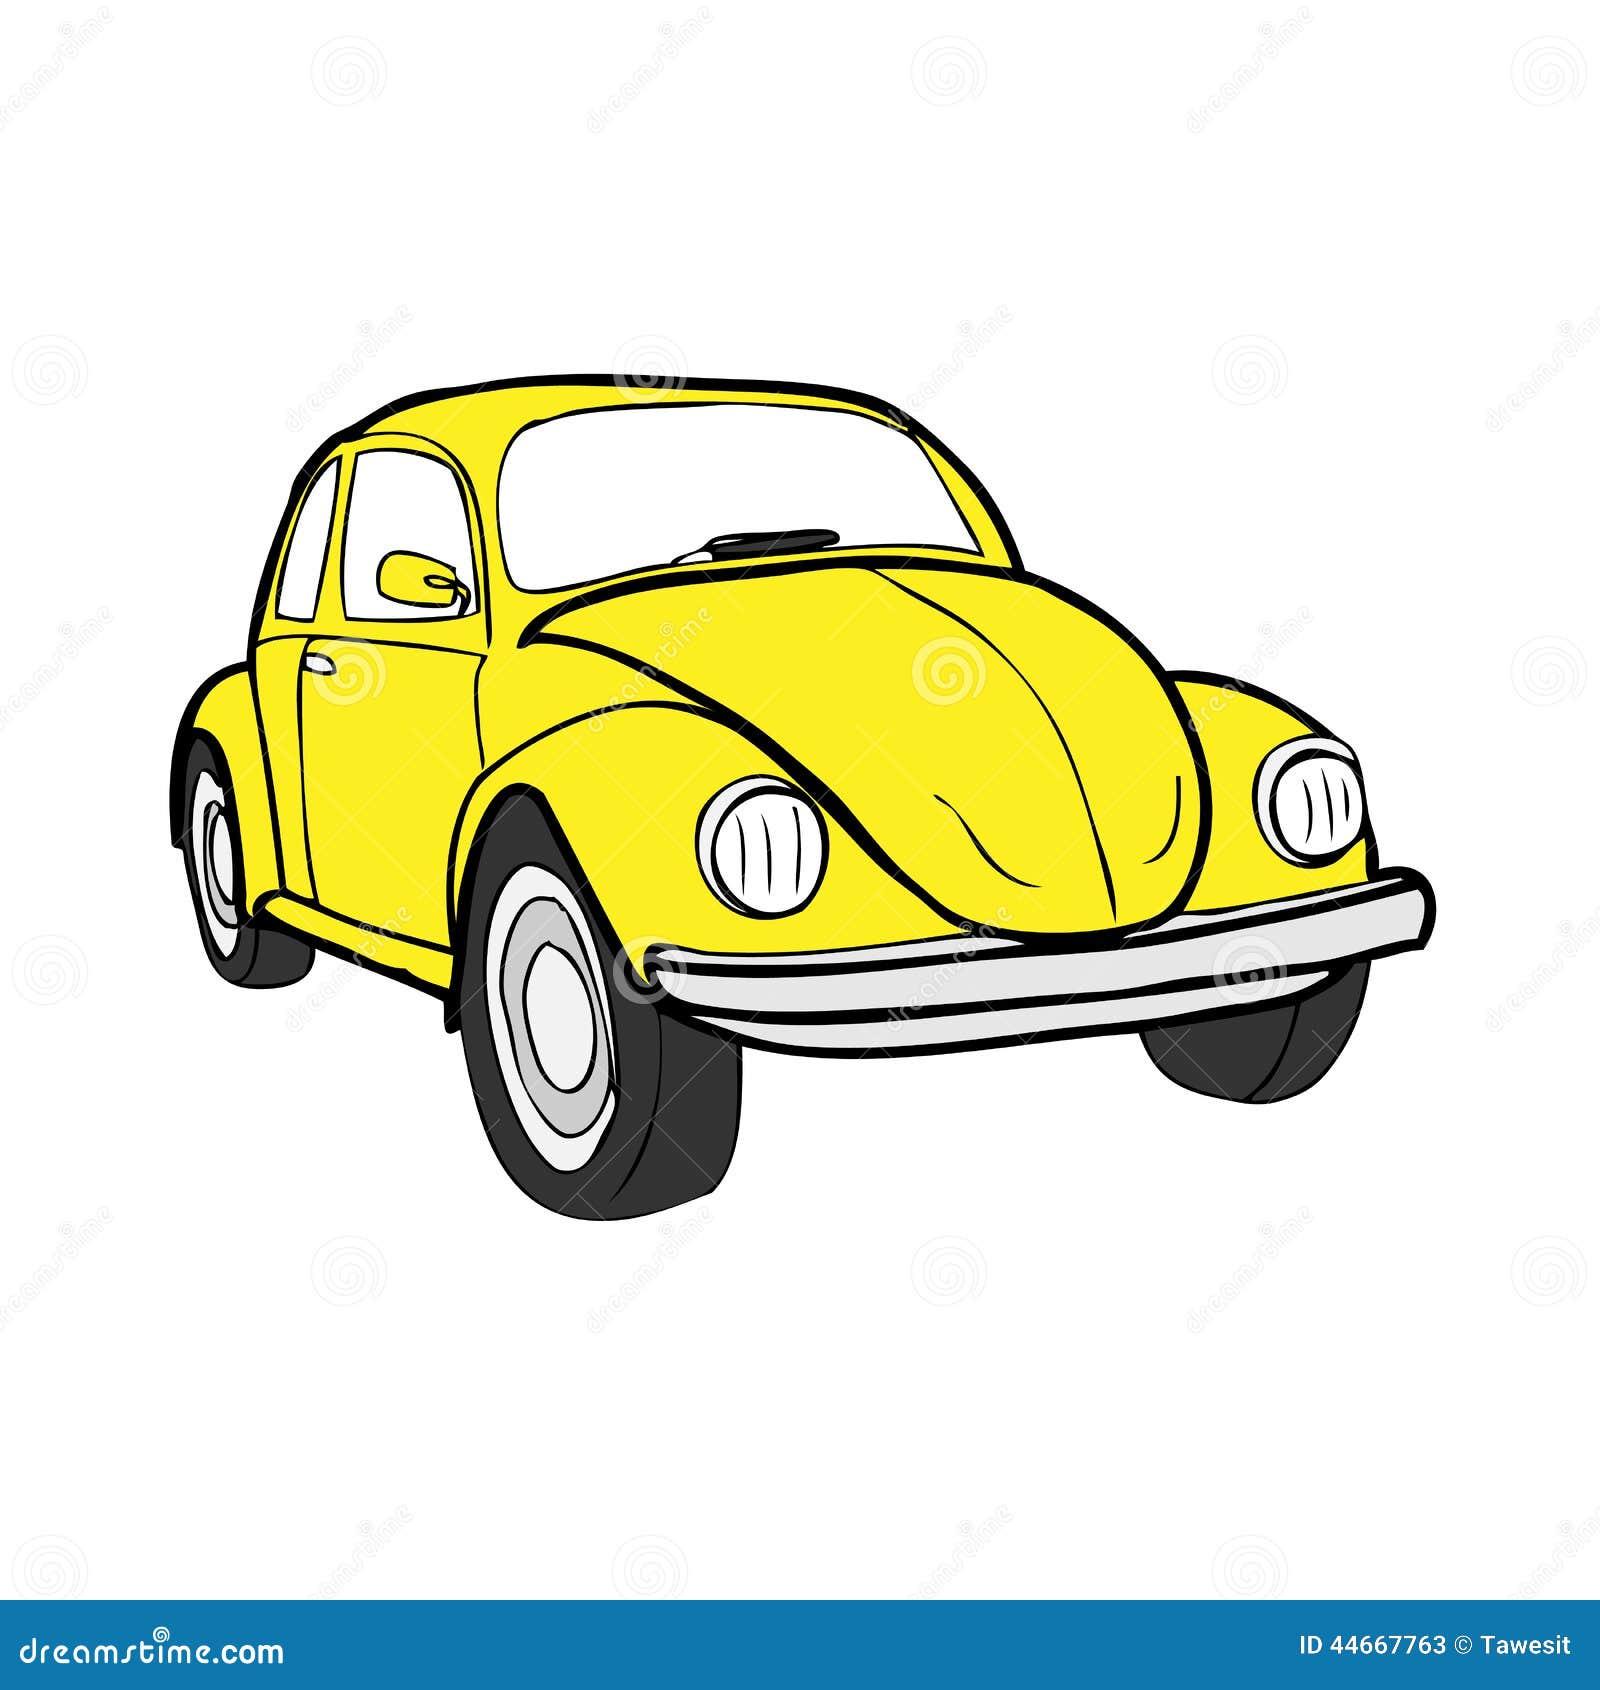 MLB 761226595 Adesivo Vw Fusca Ratlookhoodriderebaixado  JM likewise Anthonydg s Toyota Supra together with Viewtopic additionally Adisredzic  Mitsubishi Evo 9 in addition 10. on volkswagen vintage car